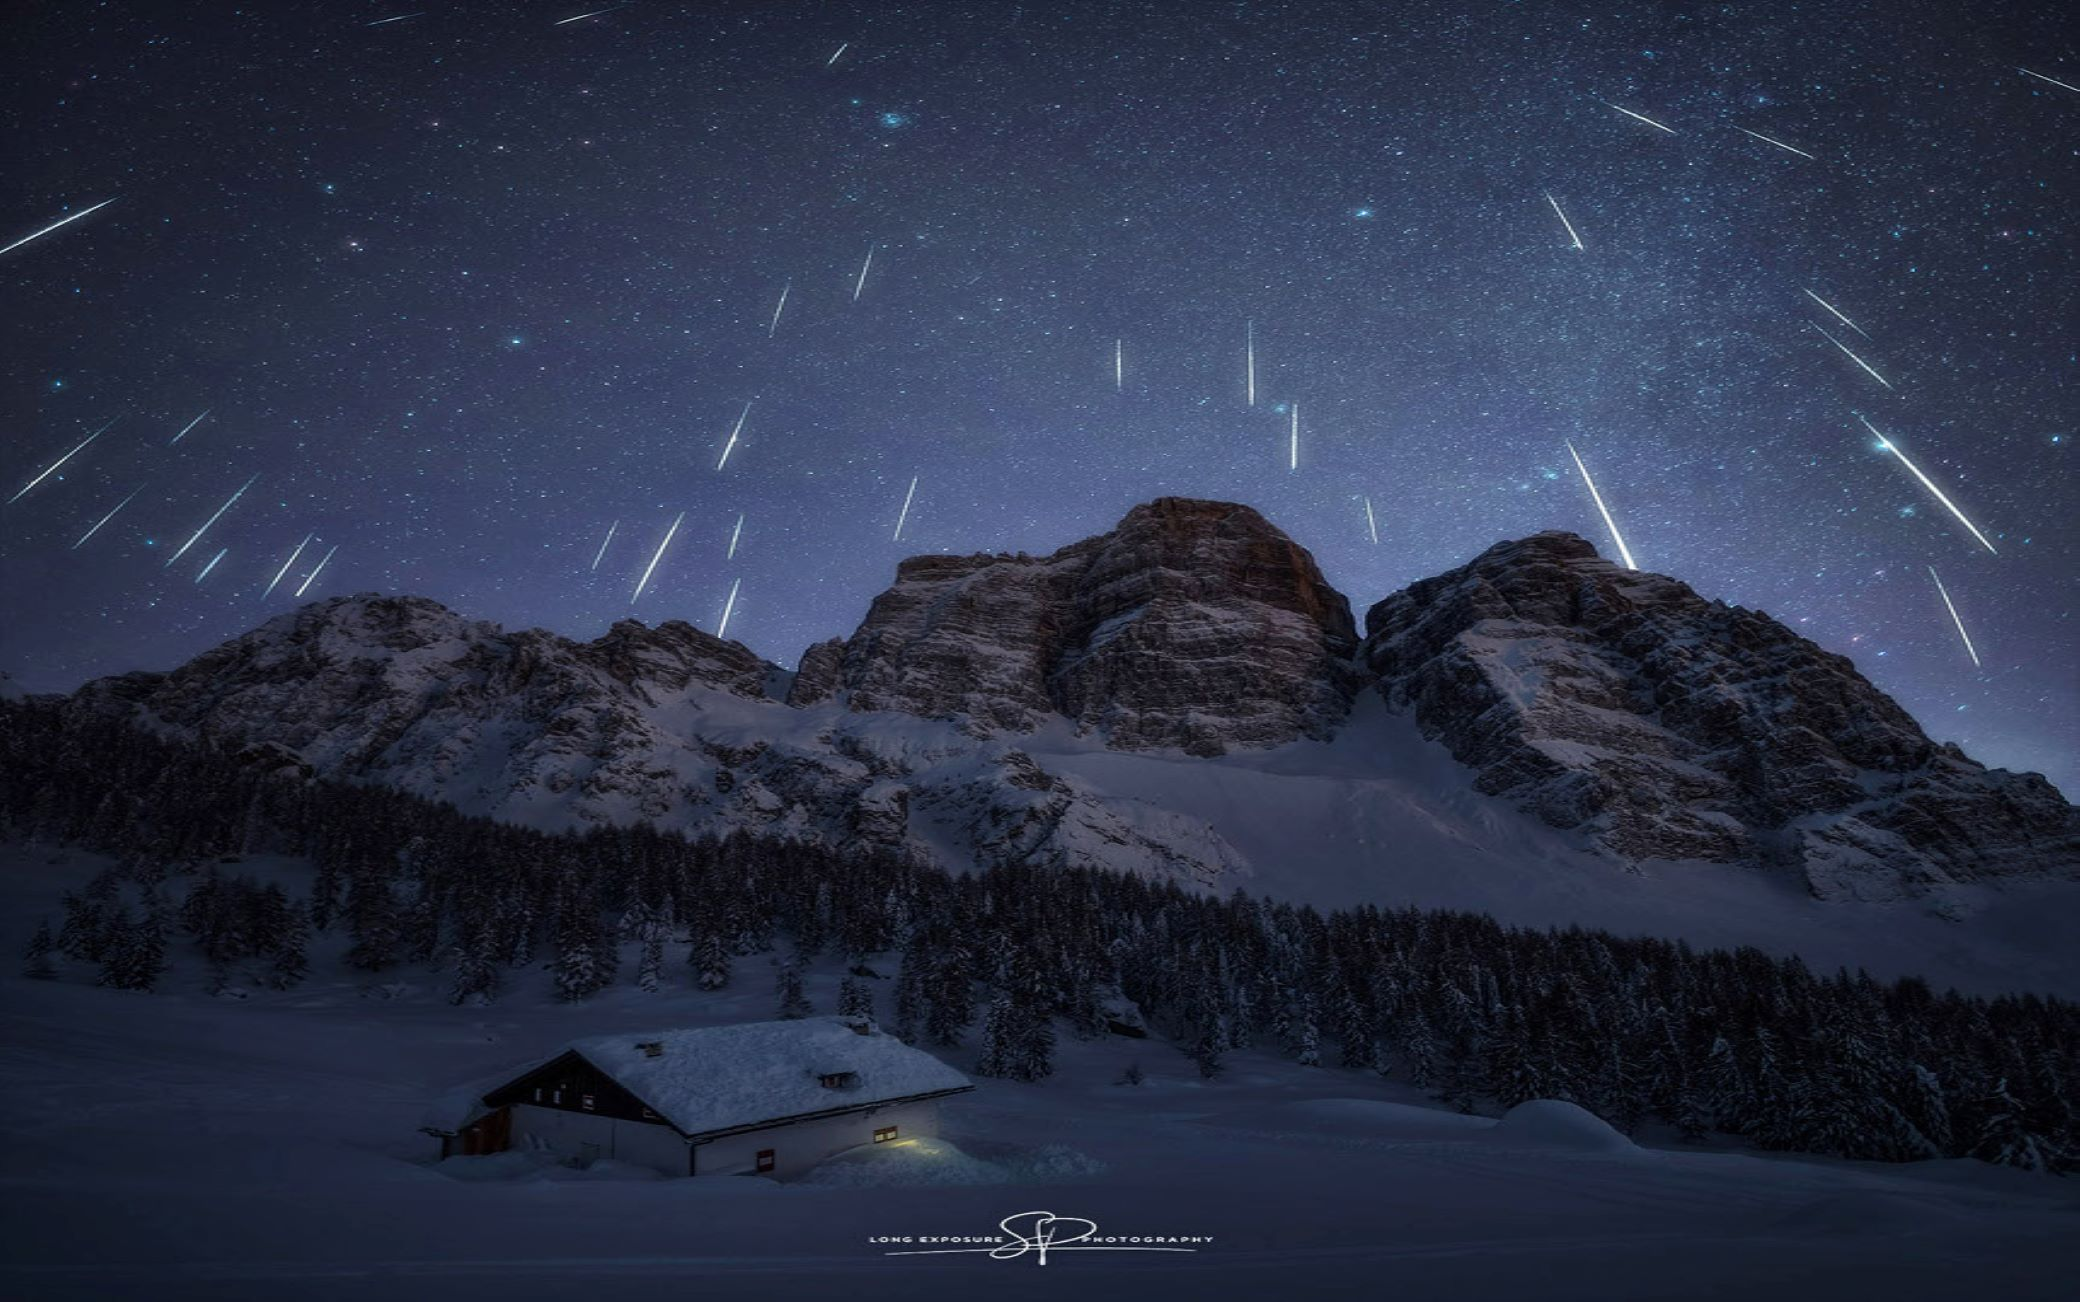 Gemini's Meteors di Stefano Pellegrini